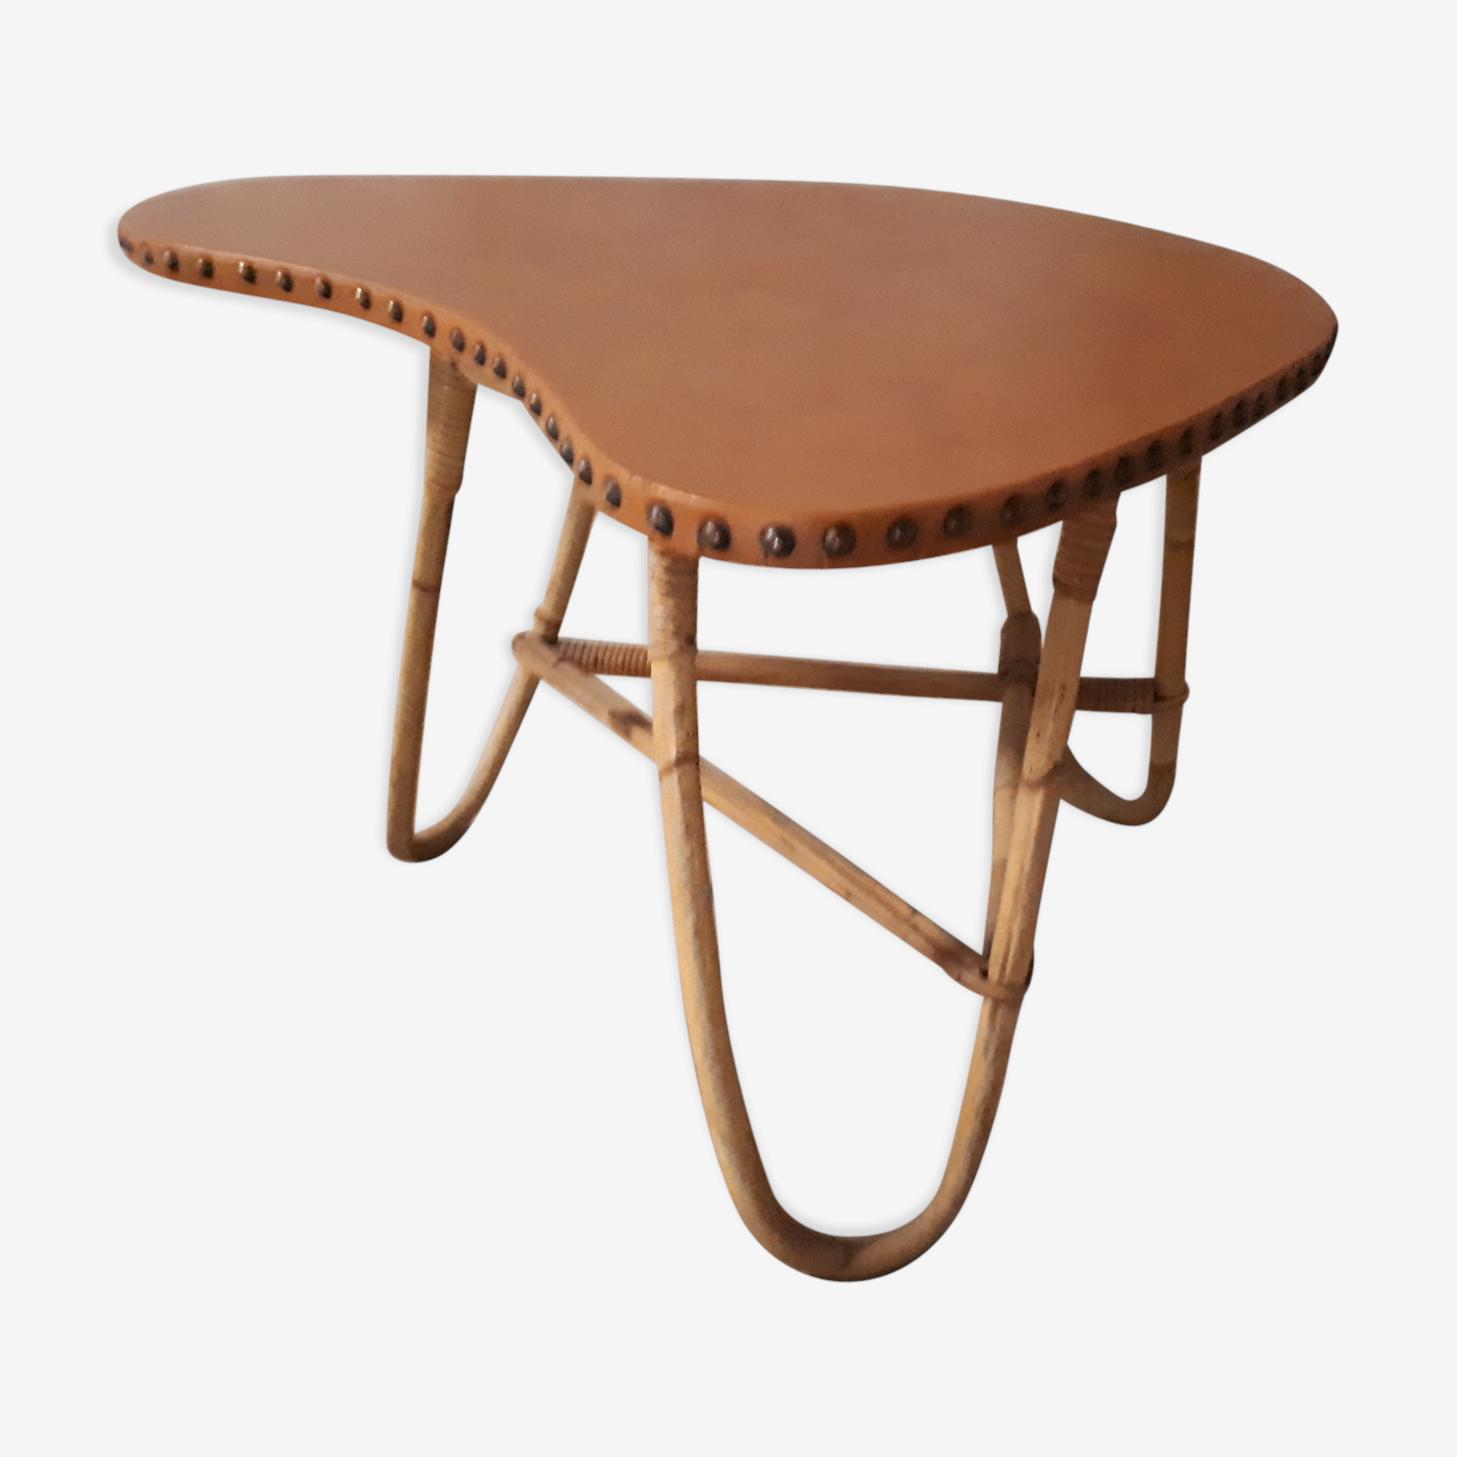 Table basse en rotin et skaï des années 60